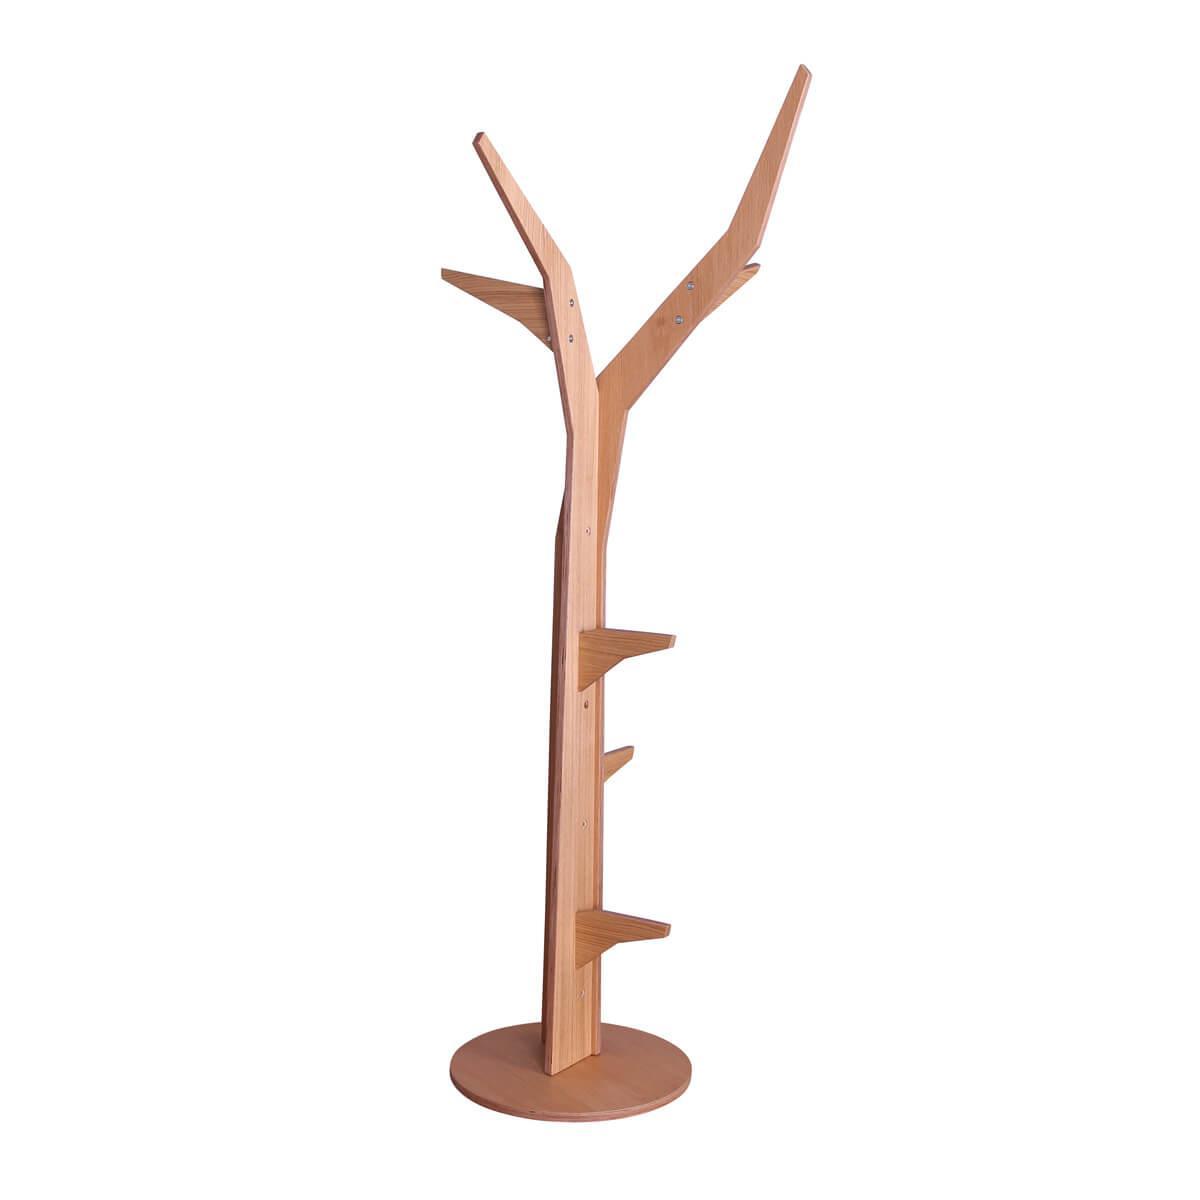 Baum freistehend-Bodenplatte KASVA Multiplex furniert Eiche-geölt